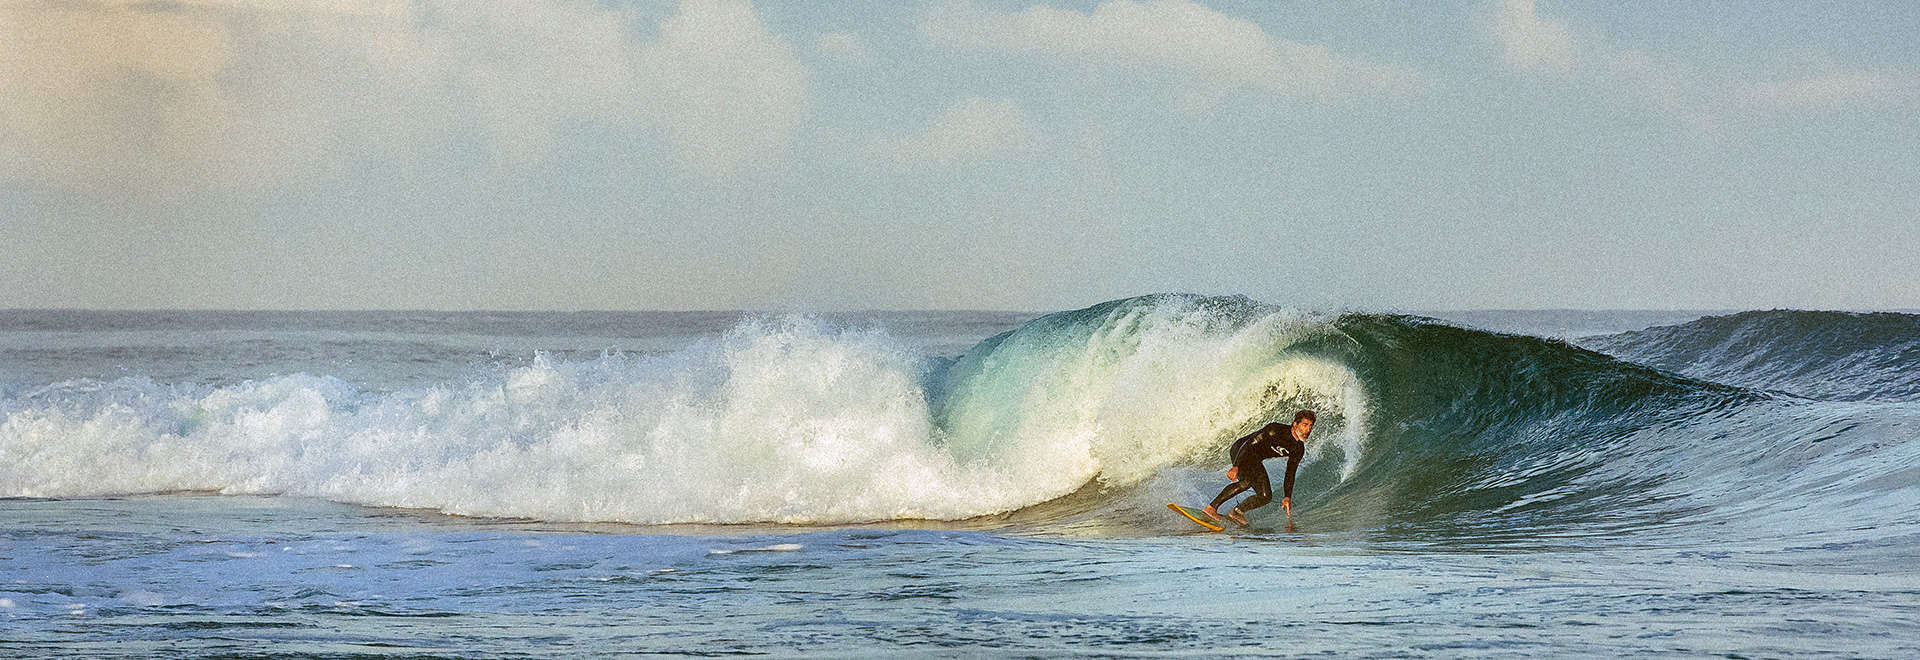 lisbon guincho karma surf school